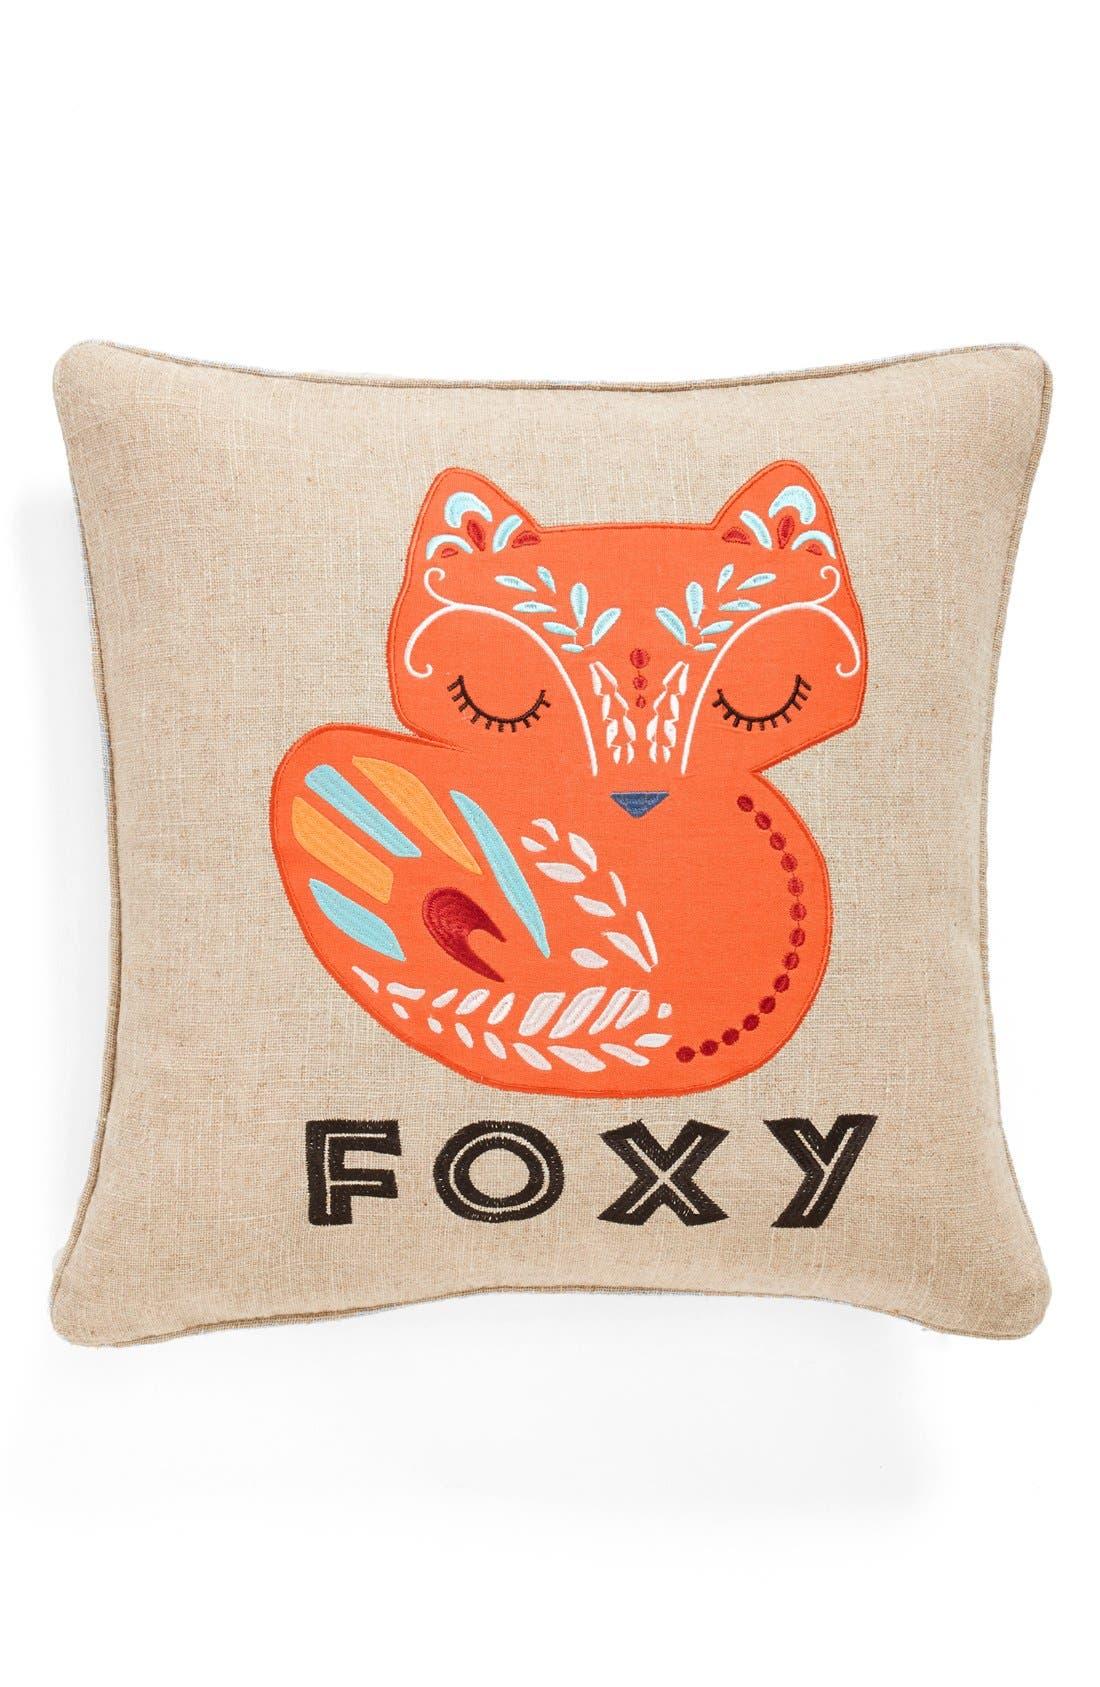 Main Image - Levtex 'Foxy' Accent Pillow